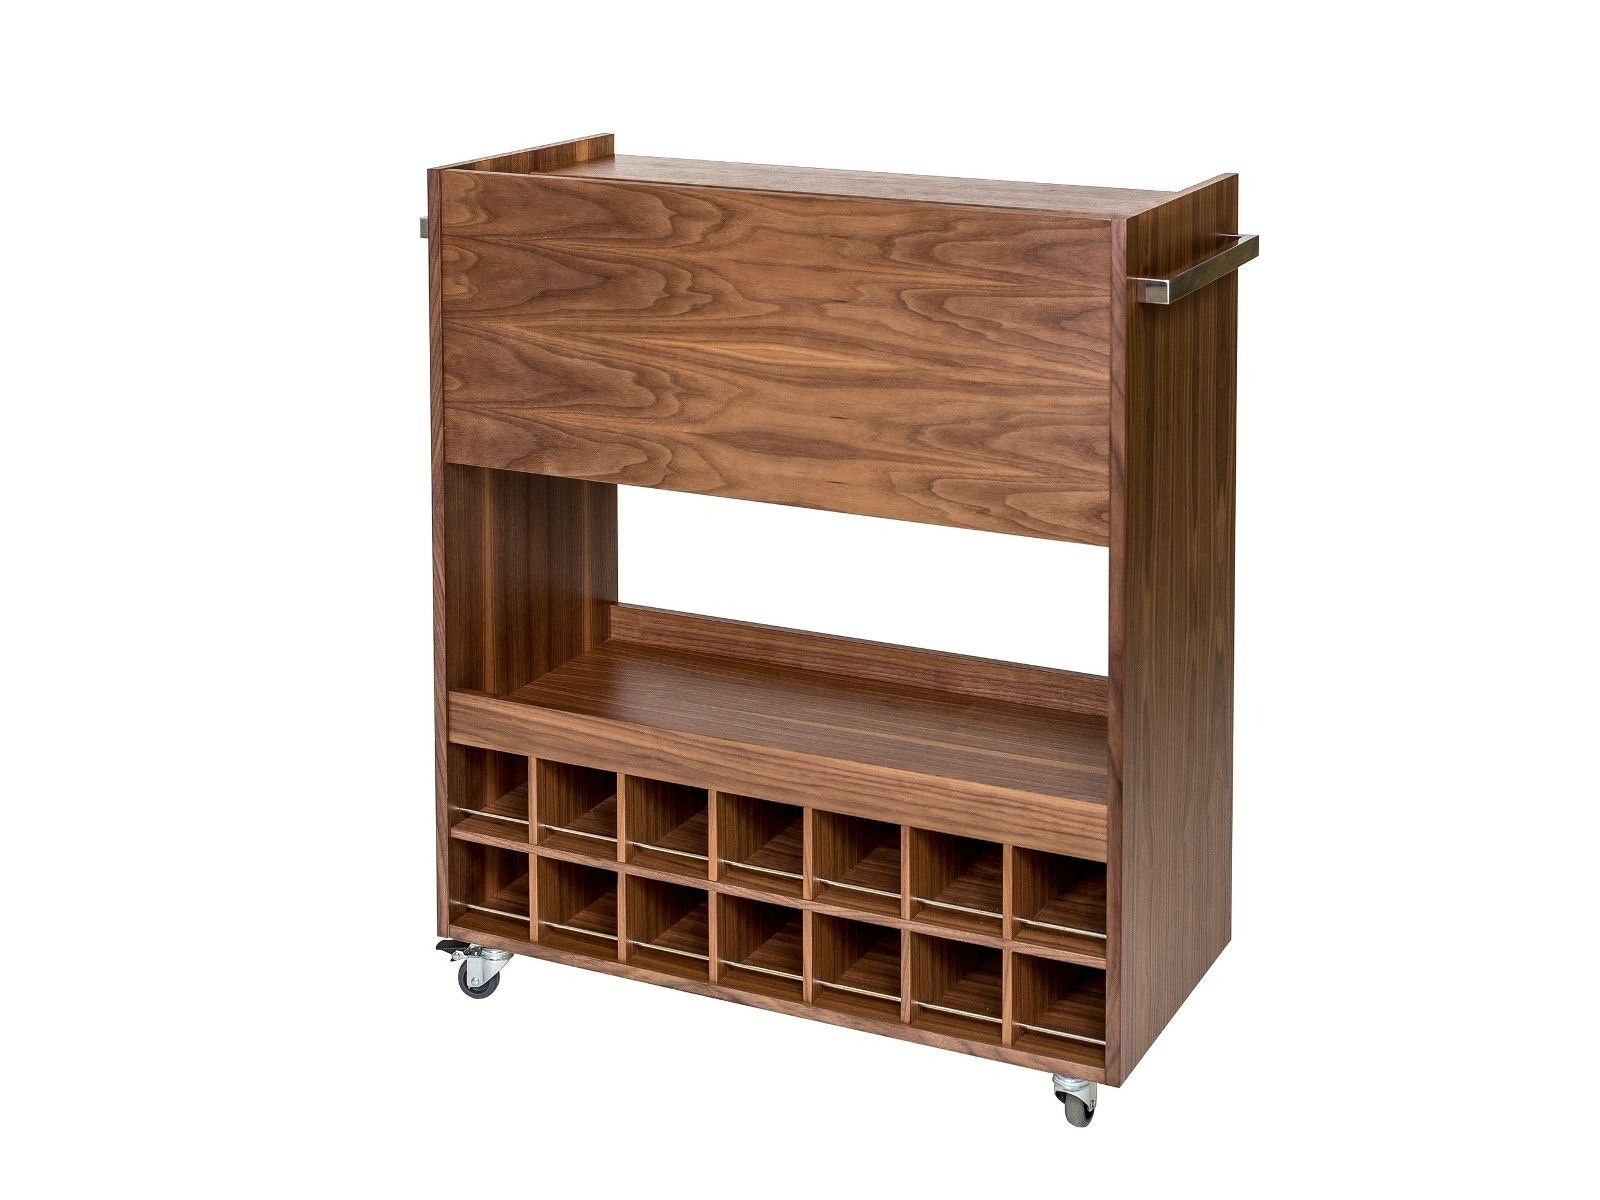 Trolley Wooden Bar Cabinet By Woodman Muebles Para Bar  # Muebles Woodman